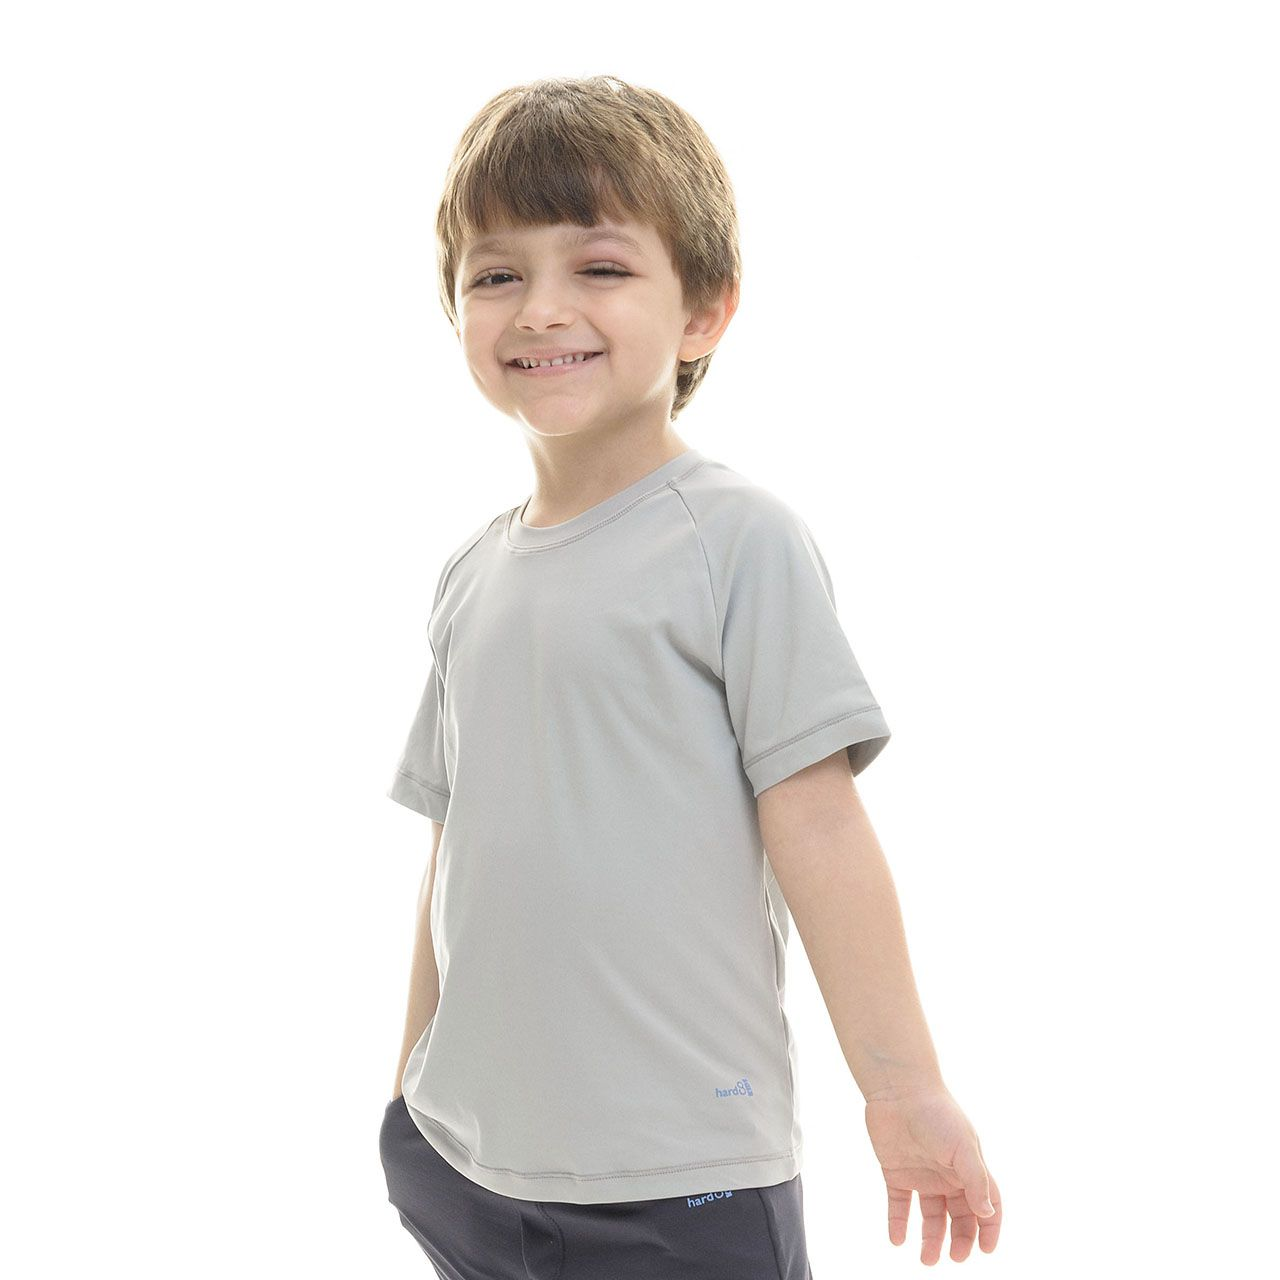 CAMISETA UNISSEX INFANTIL MANGA CURTA PROTEÇÃO UV 50+